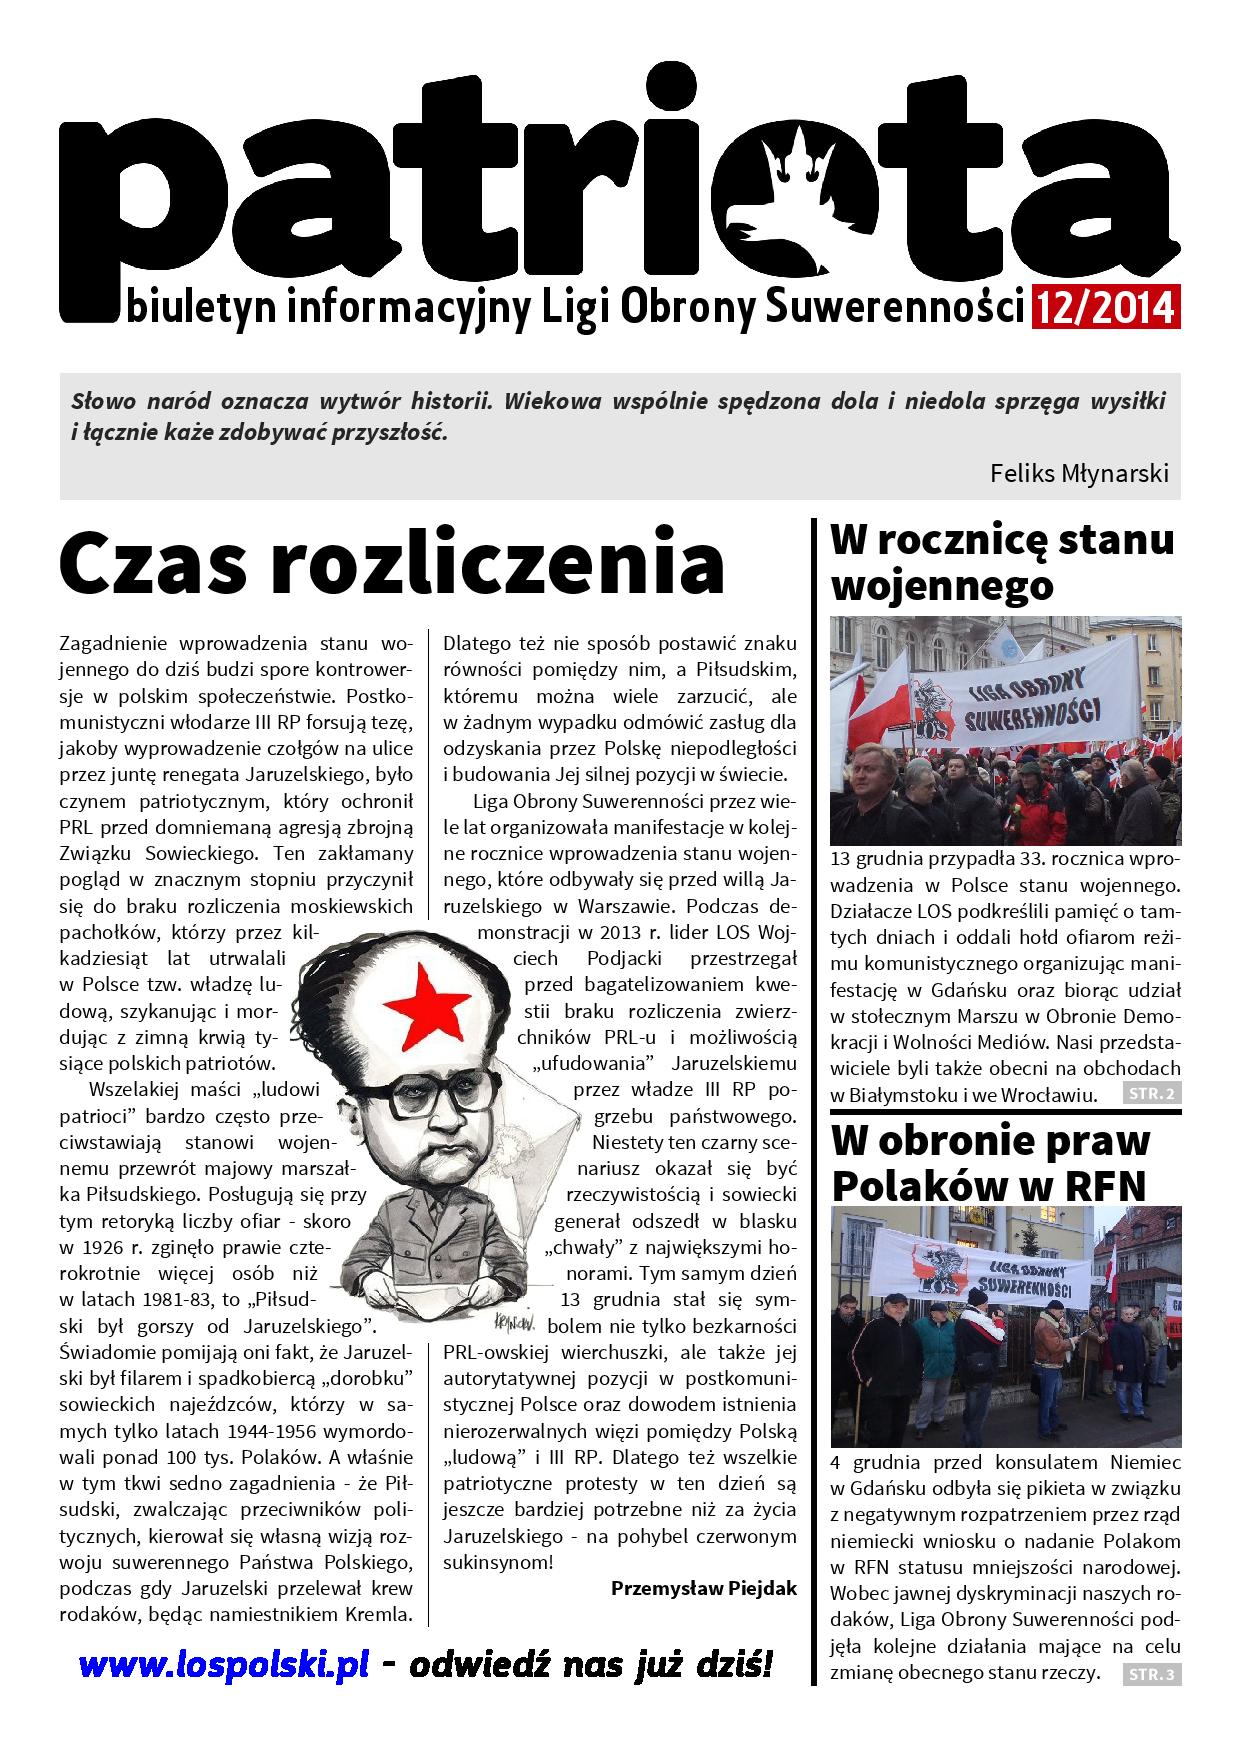 Patriota 12/2014